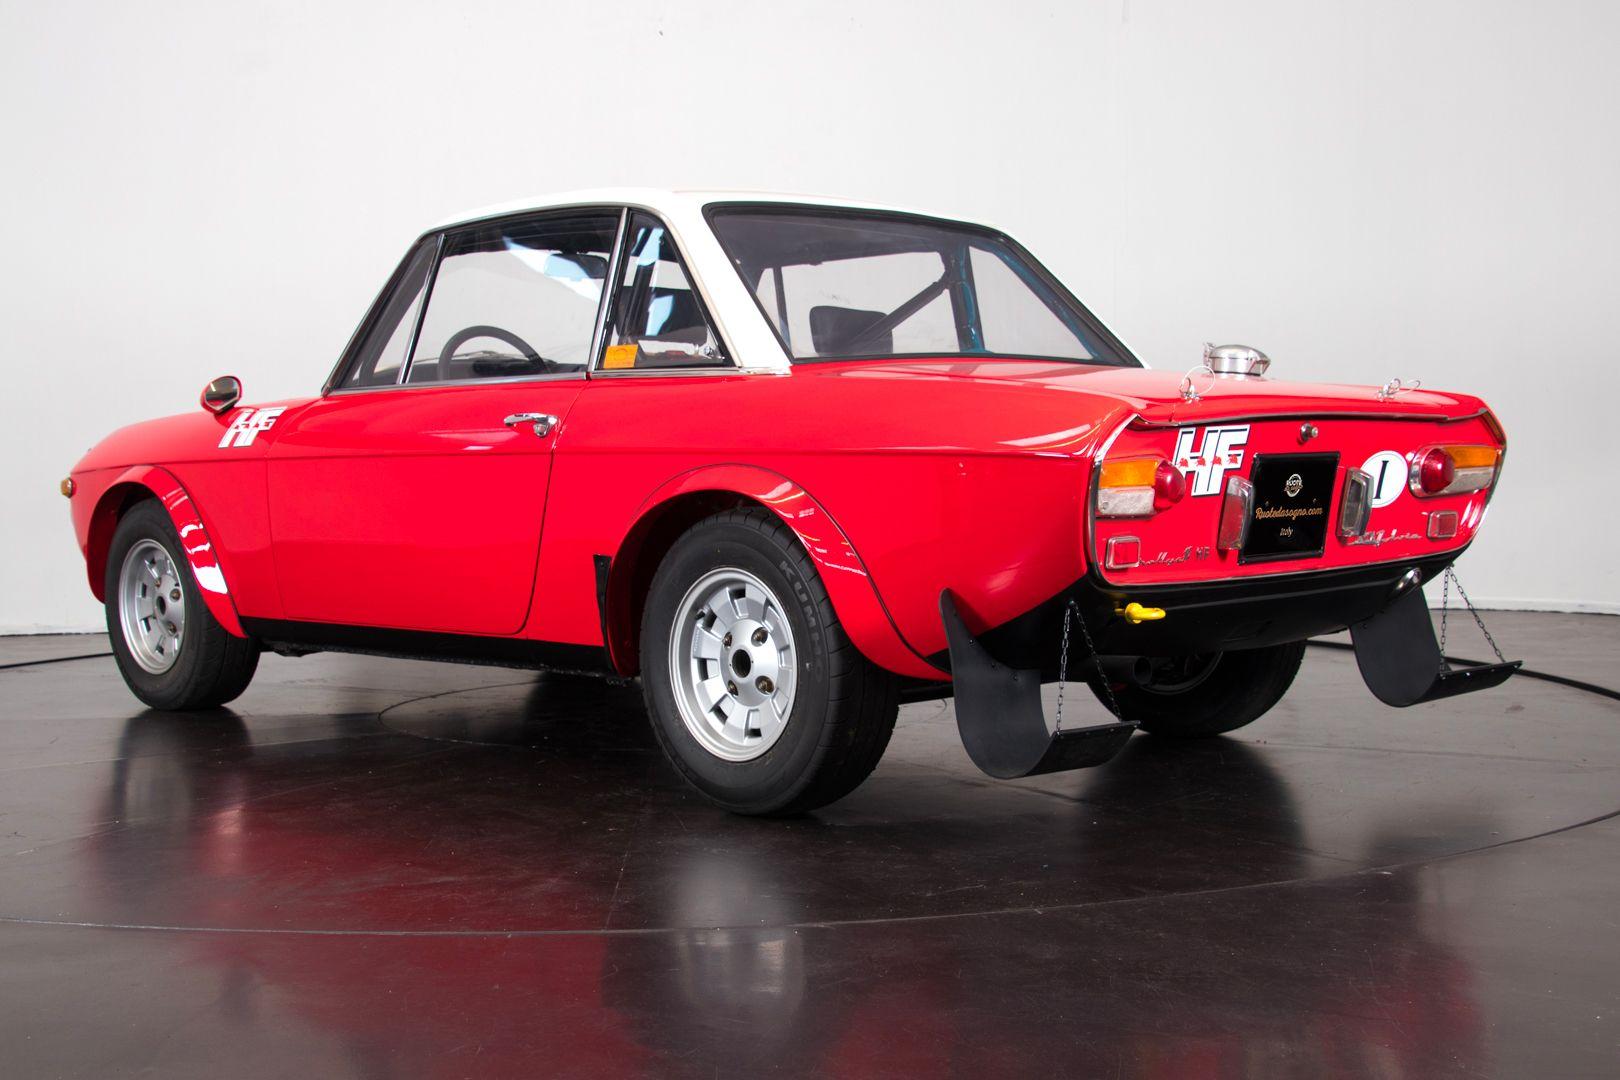 1970 Lancia Fulvia HF 1.6 - Gruppo 4 18808